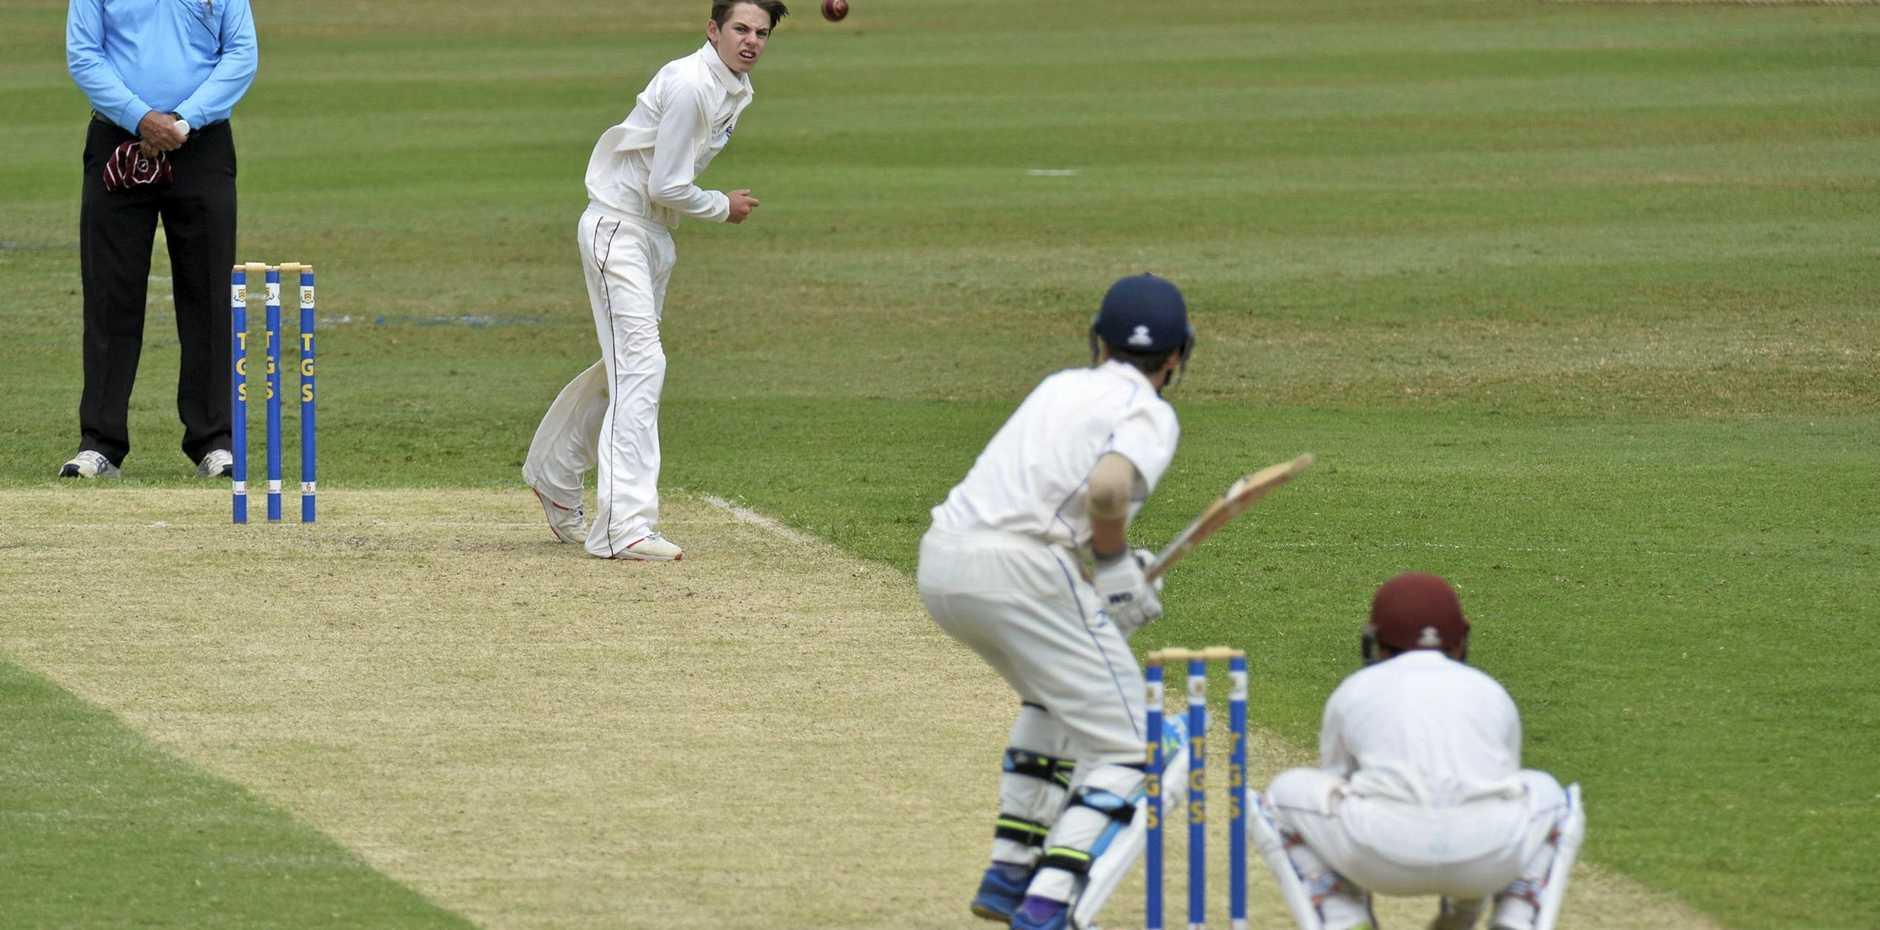 Lachlan Bell bowls for against Ipswich Grammar School against Toowoomba Grammar School in GPS Competition round three cricket at Toowoomba Grammar School, , Saturday, February 16, 2019.